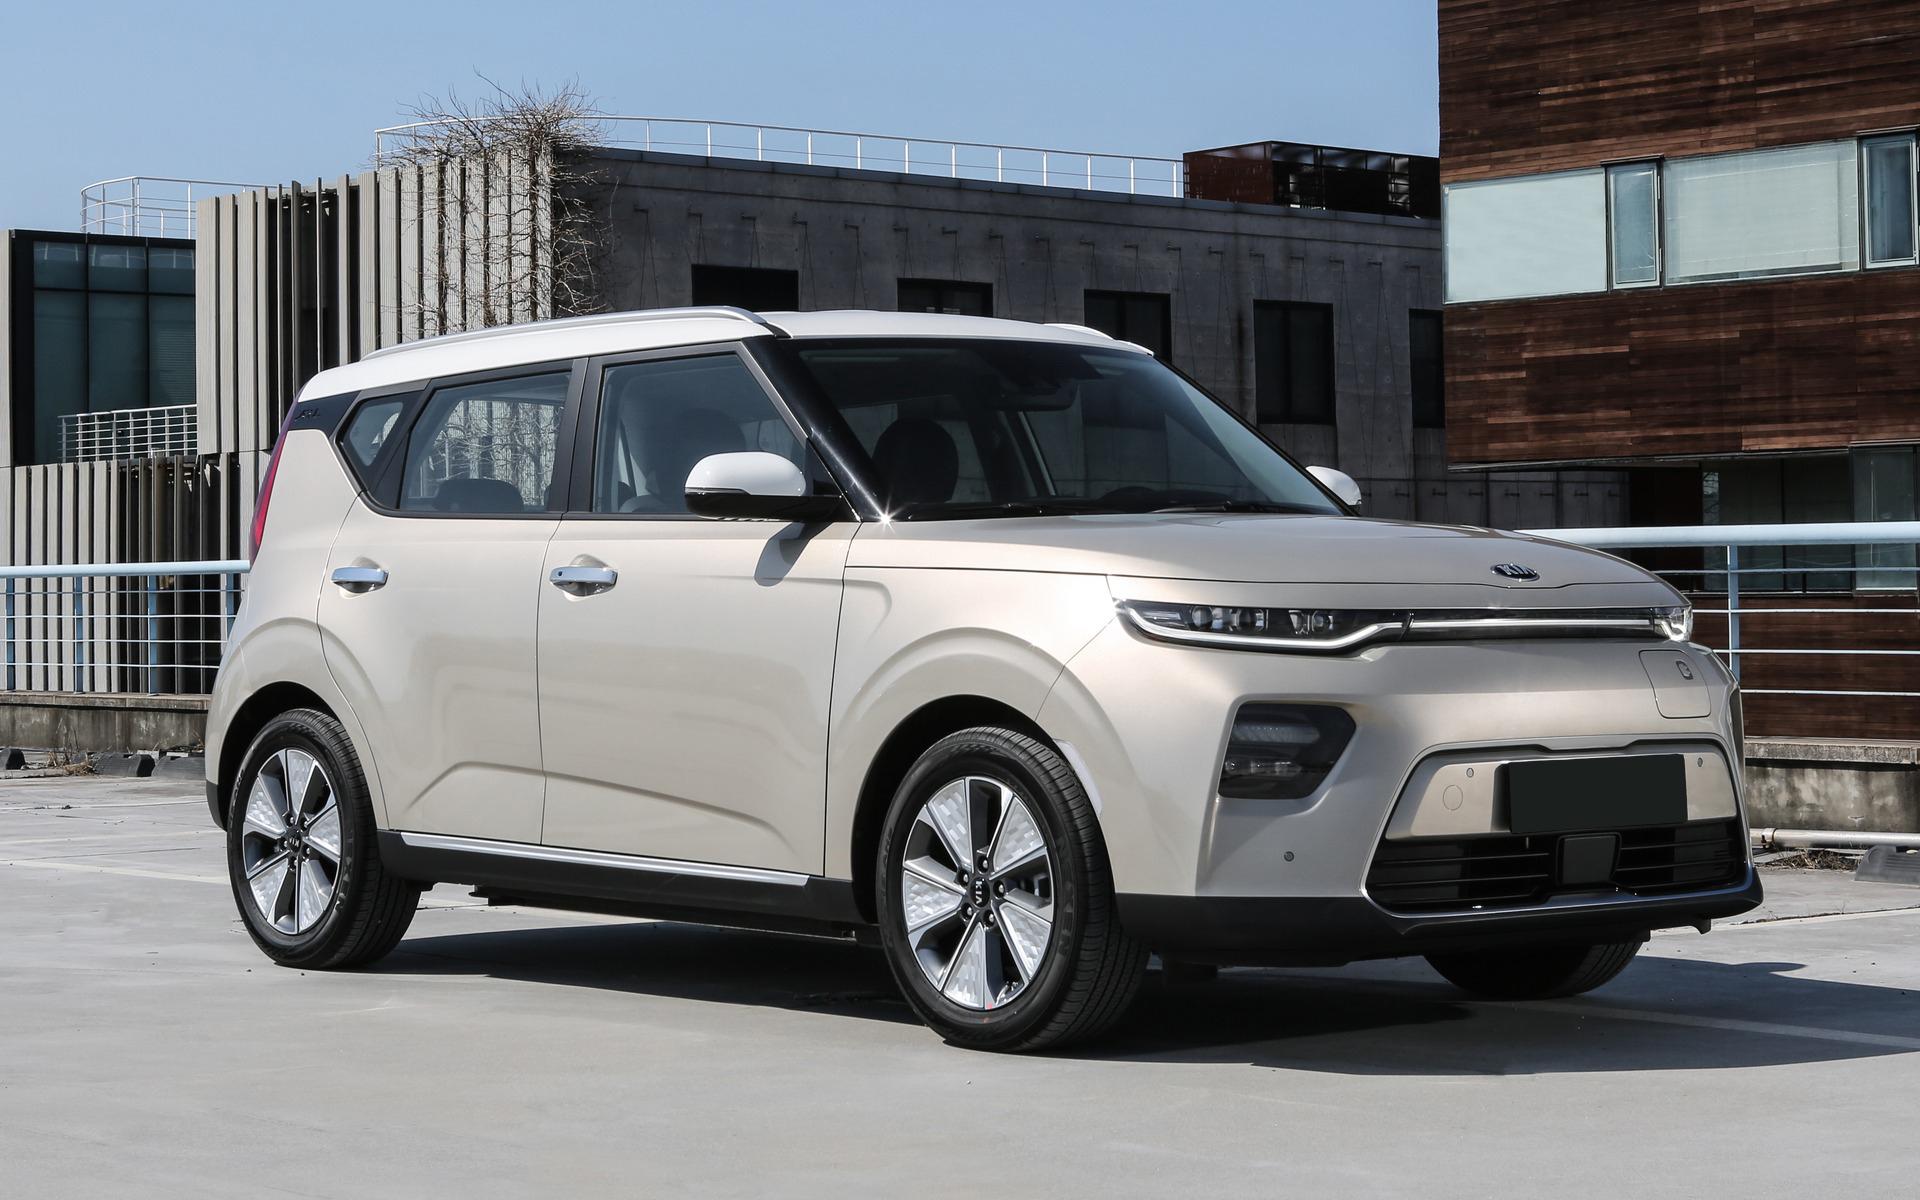 2022 Kia Soul Hybrid Price